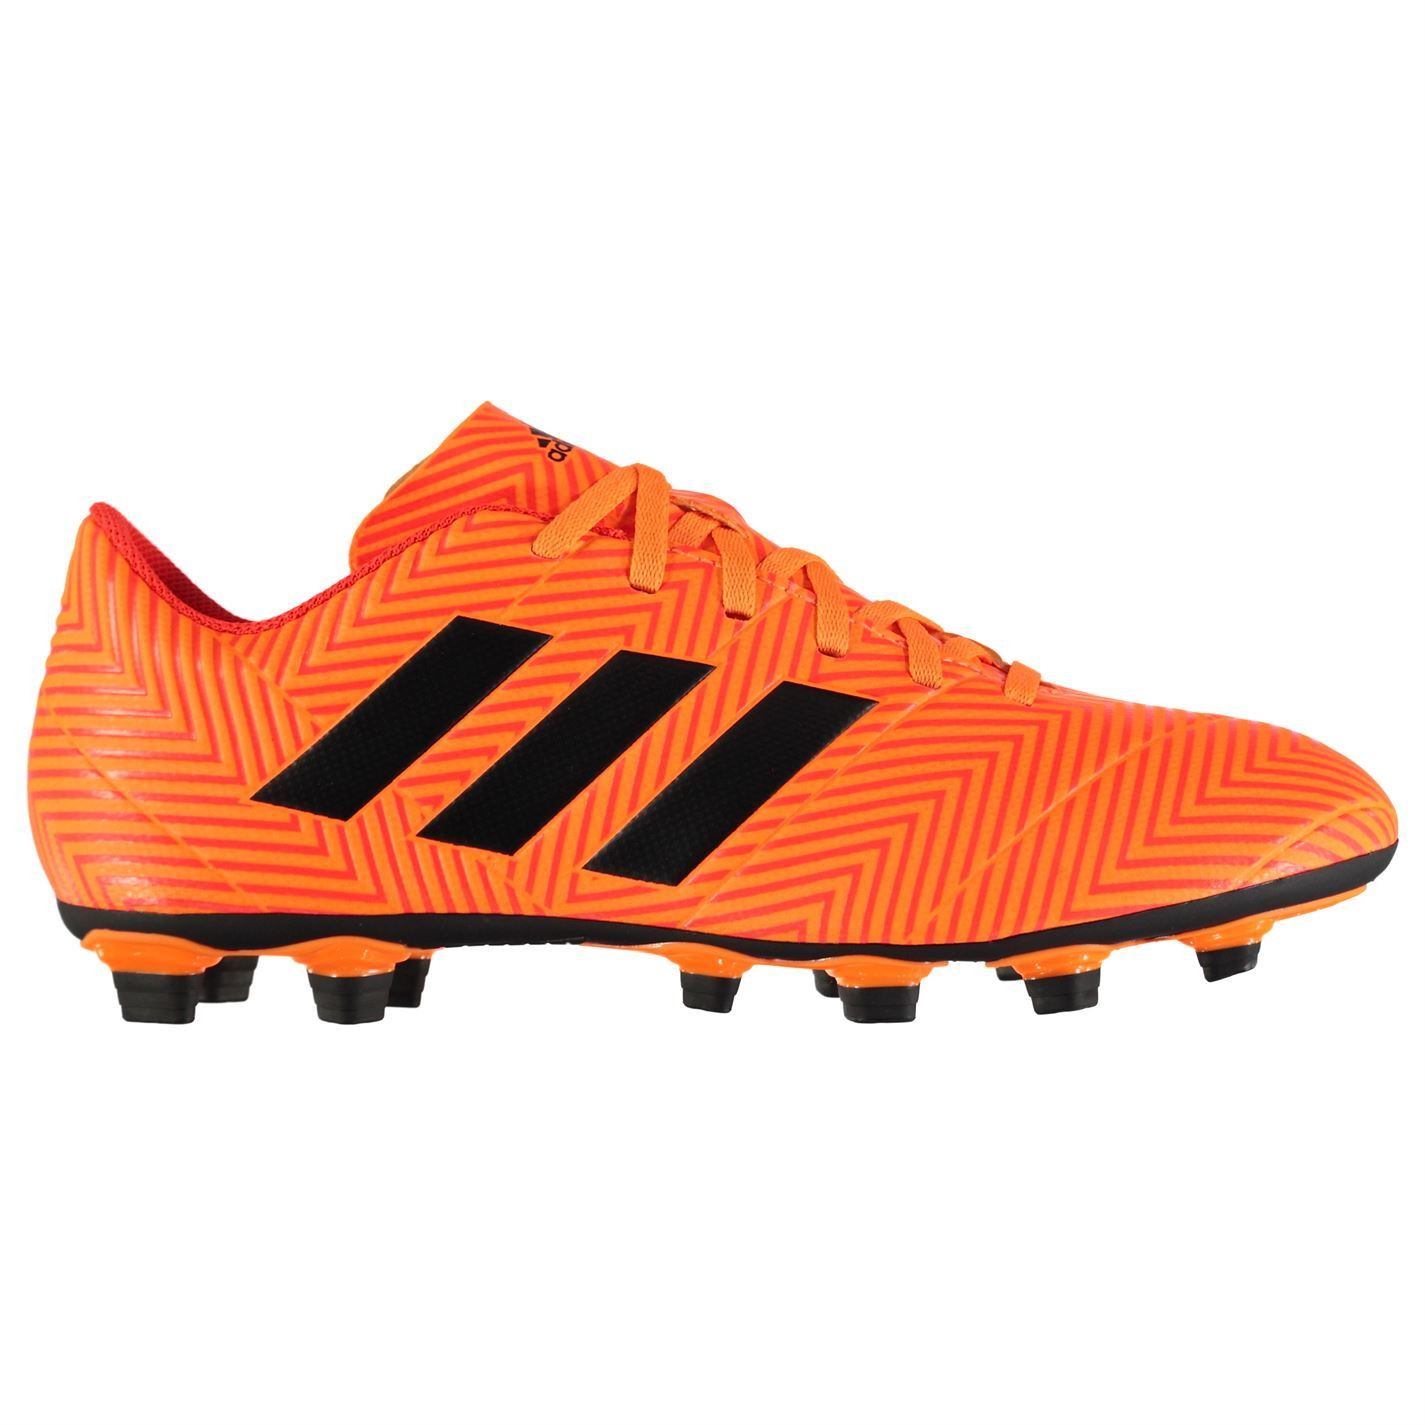 305b2ef16 ... adidas Nemeziz 18.4 Firm Ground Football Boots Mens Orange Soccer Shoes  Cleats ...